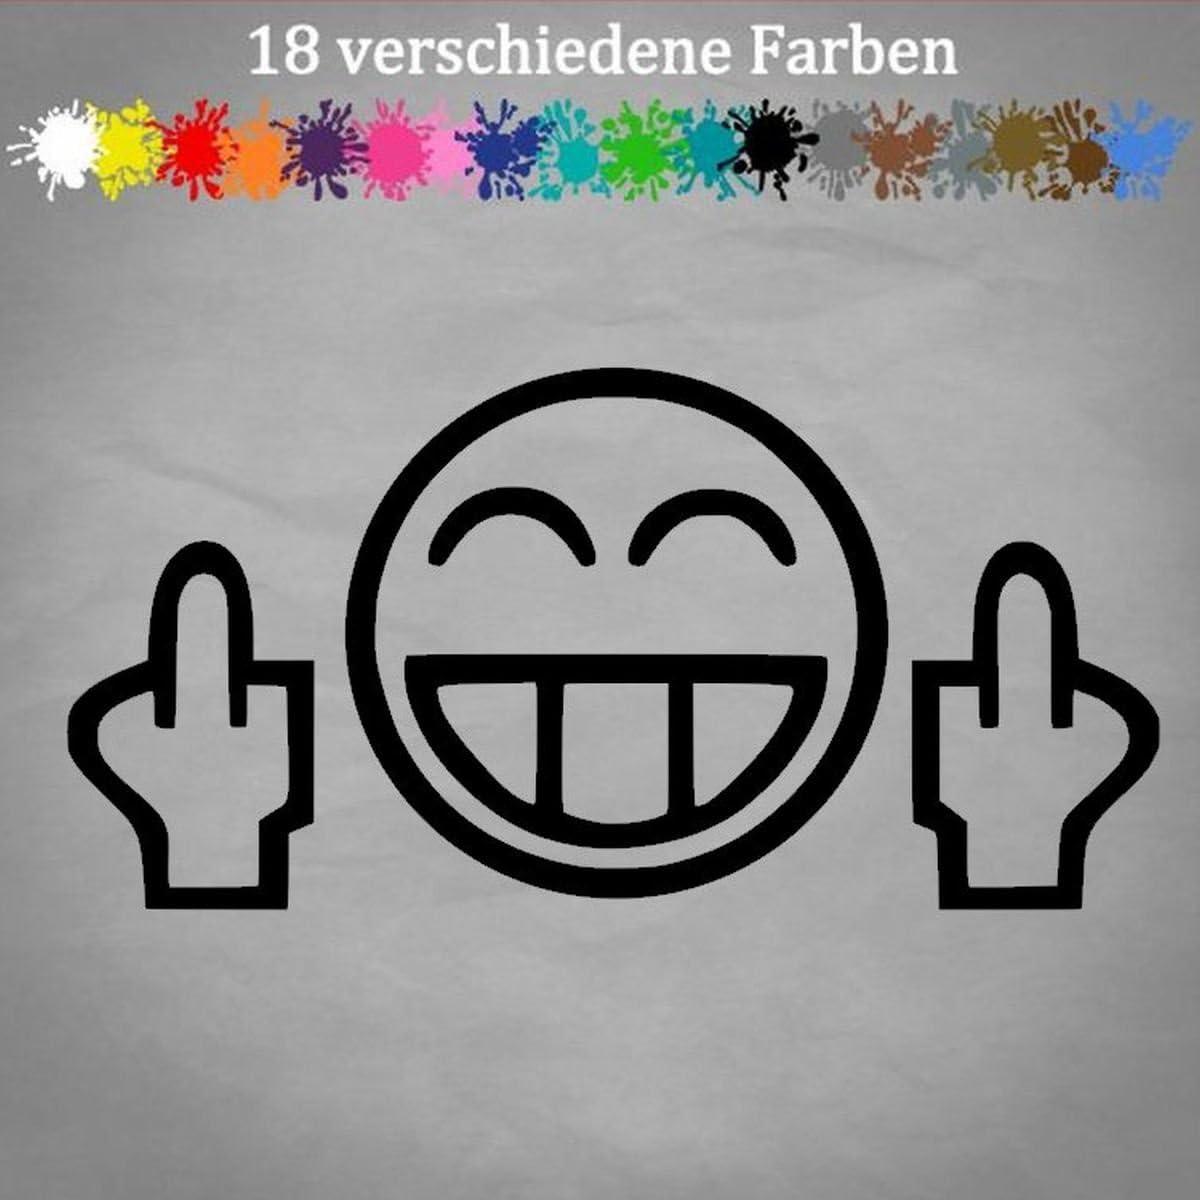 Generic Mittelfinger 20x10cm Smiley Auto Aufkleber Golf Opel Gti Tuning Jdm Oem Sticker In 18 Farben Auto